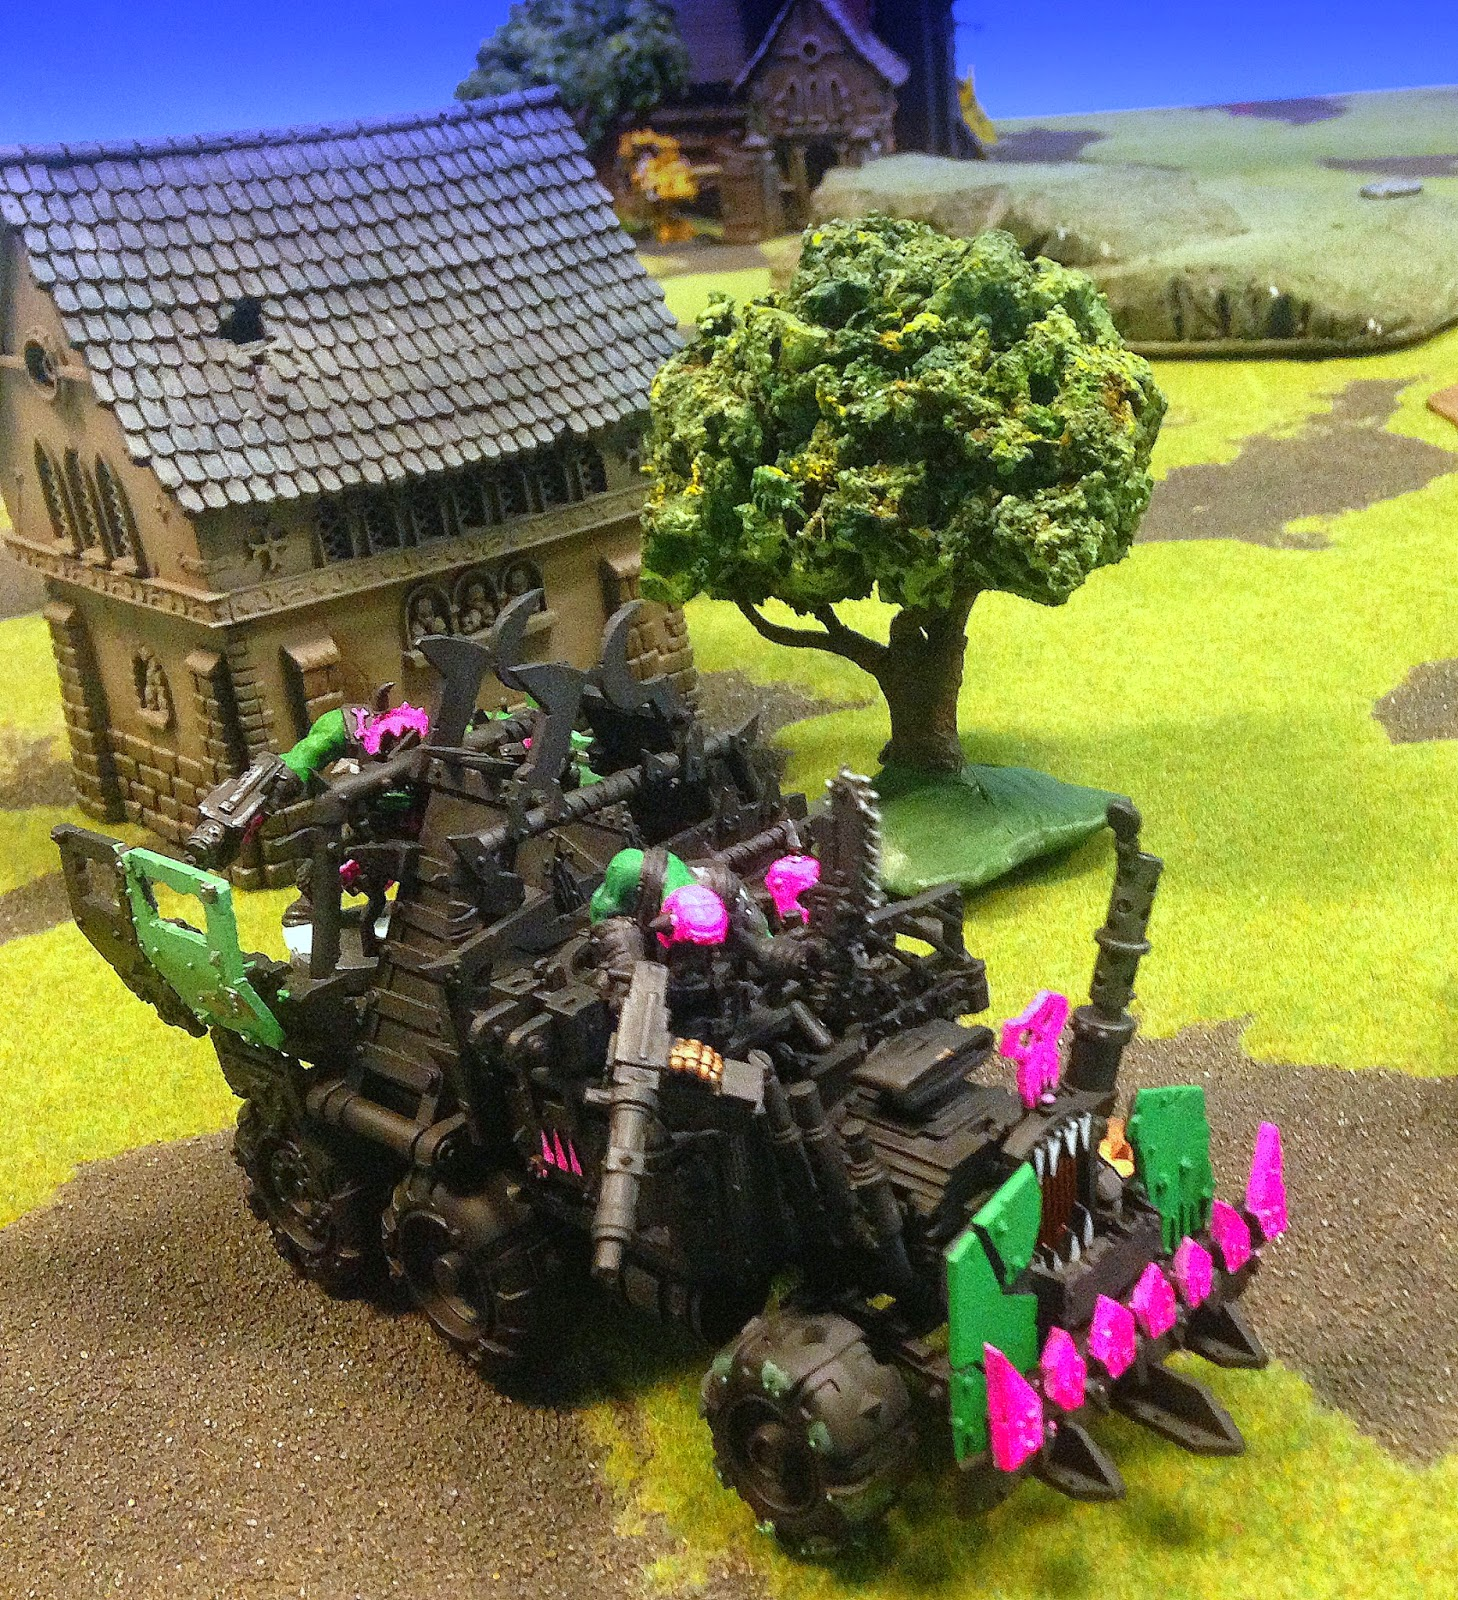 Pink Orks, Pink Orkys, Pink Trukk, Warhammer 40K, Battle Gaming One